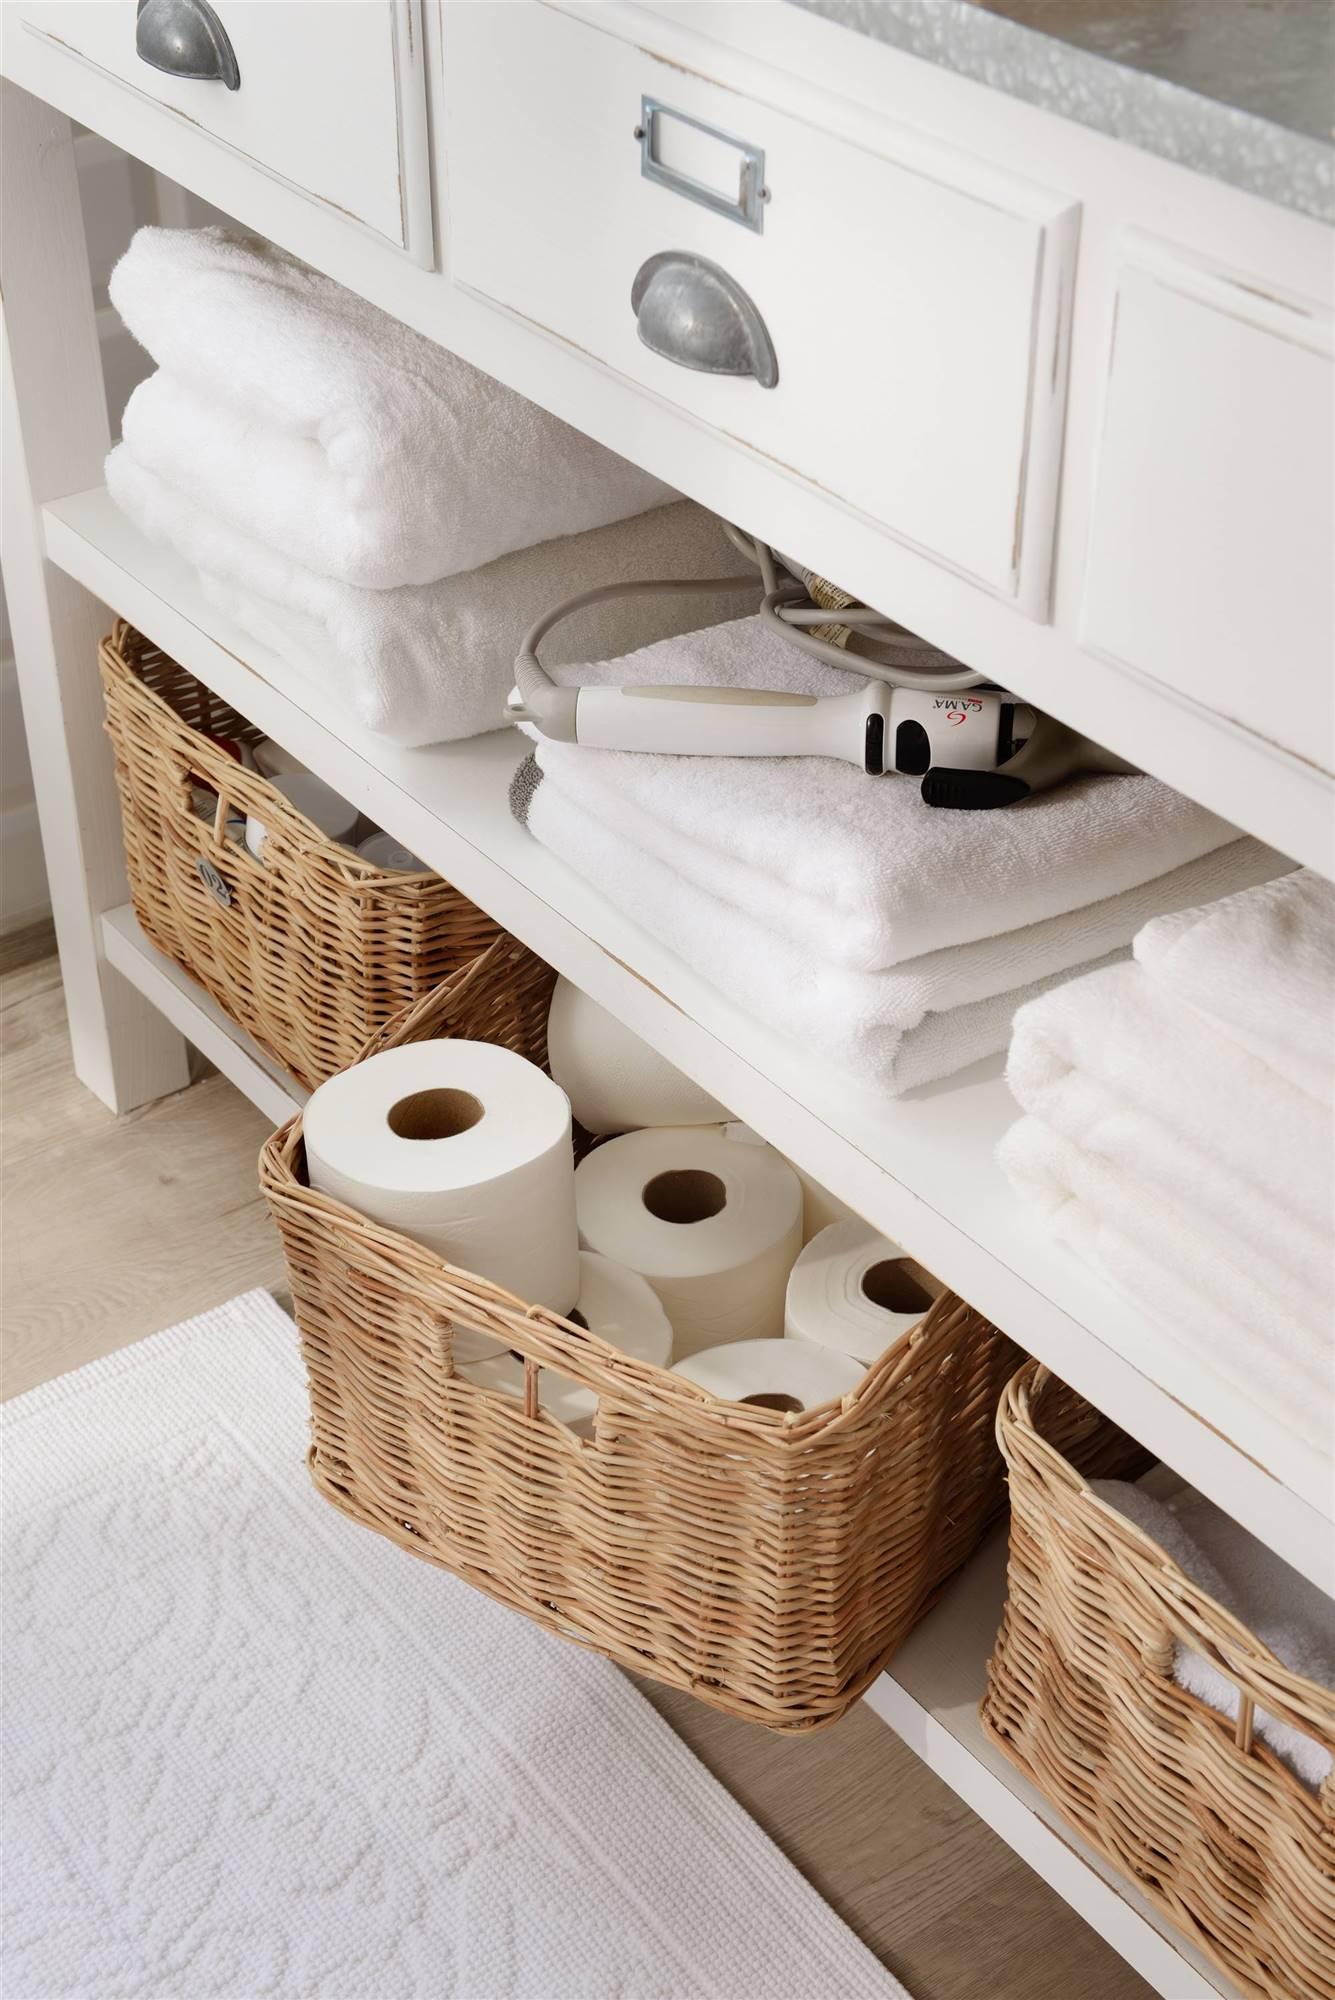 Elige materiales resistentes para tus contenedores o canastas